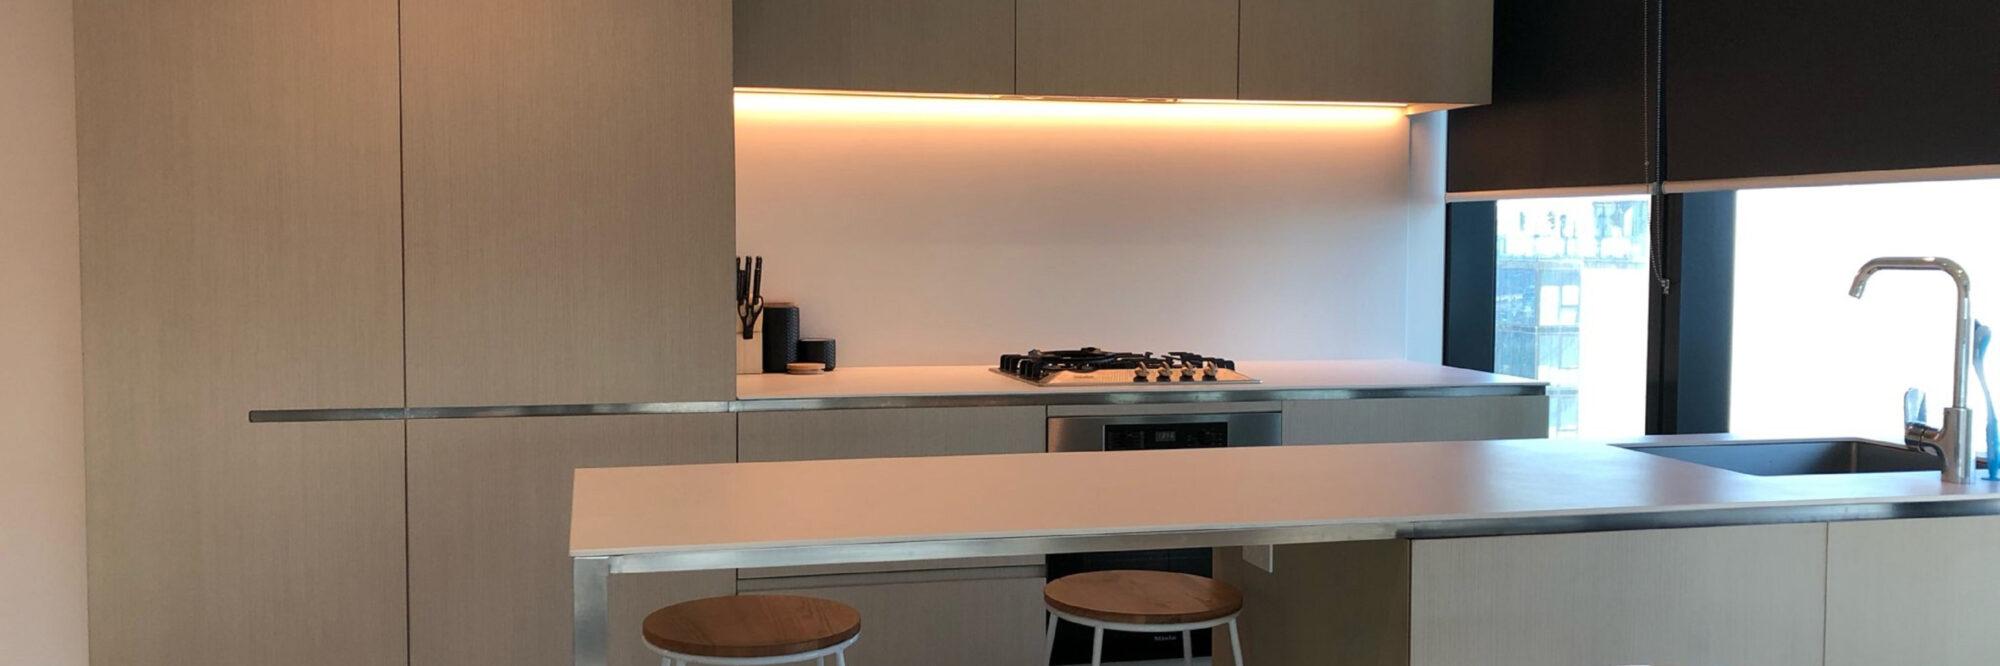 Australia 108 | Serviced Apartments Melbourne